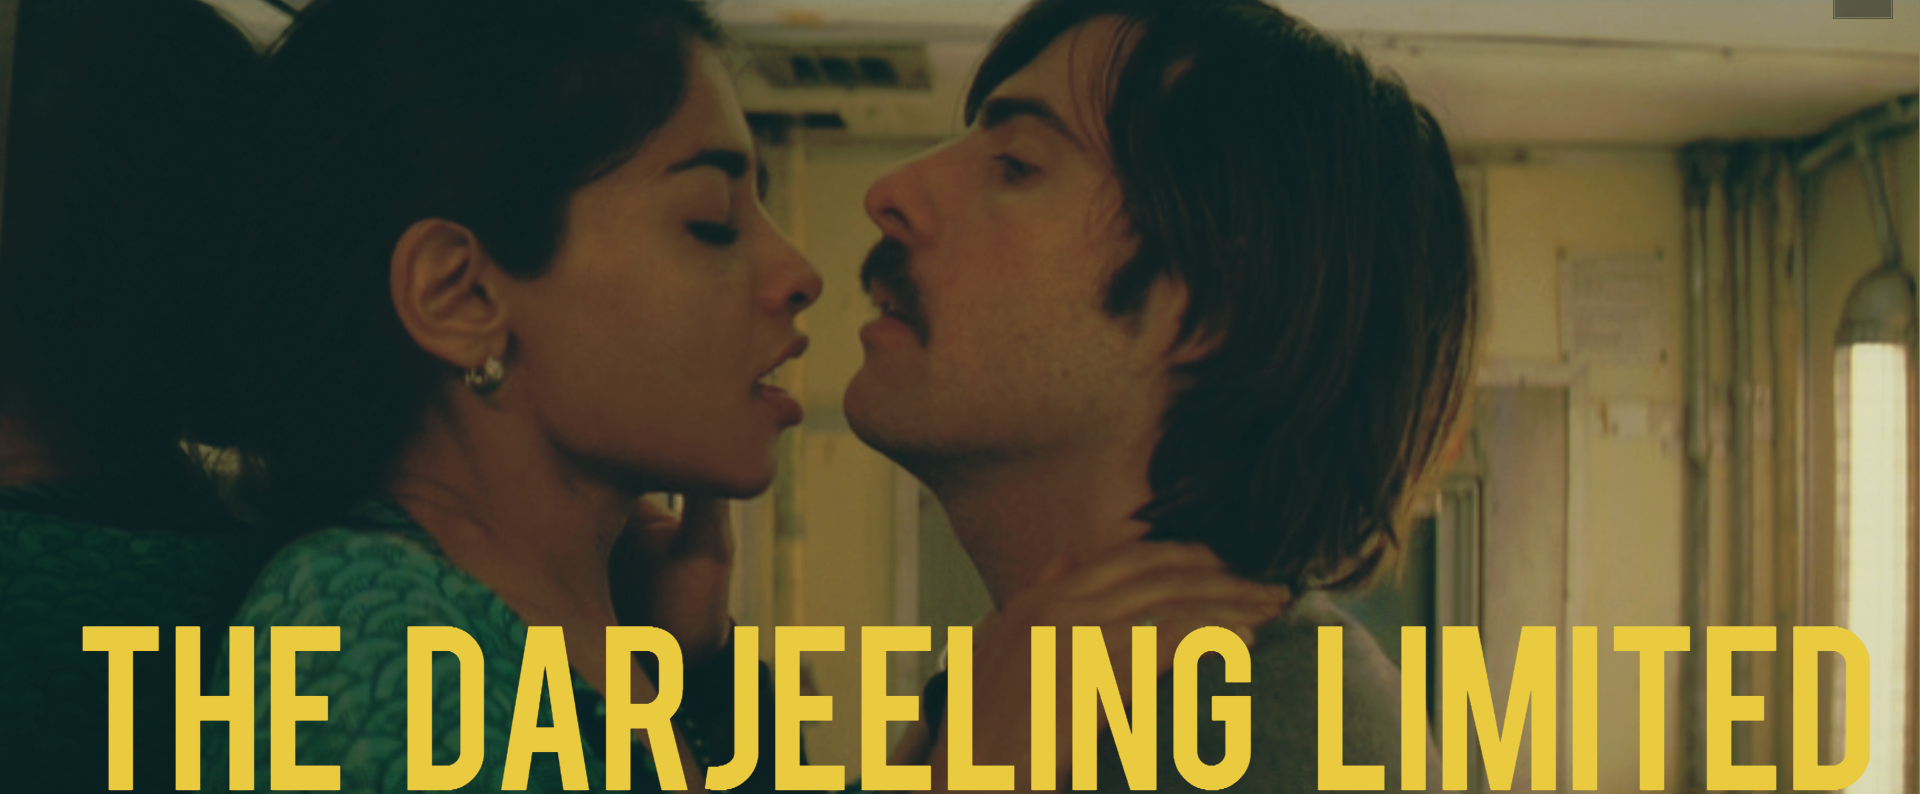 darjeeling Amara limited karan